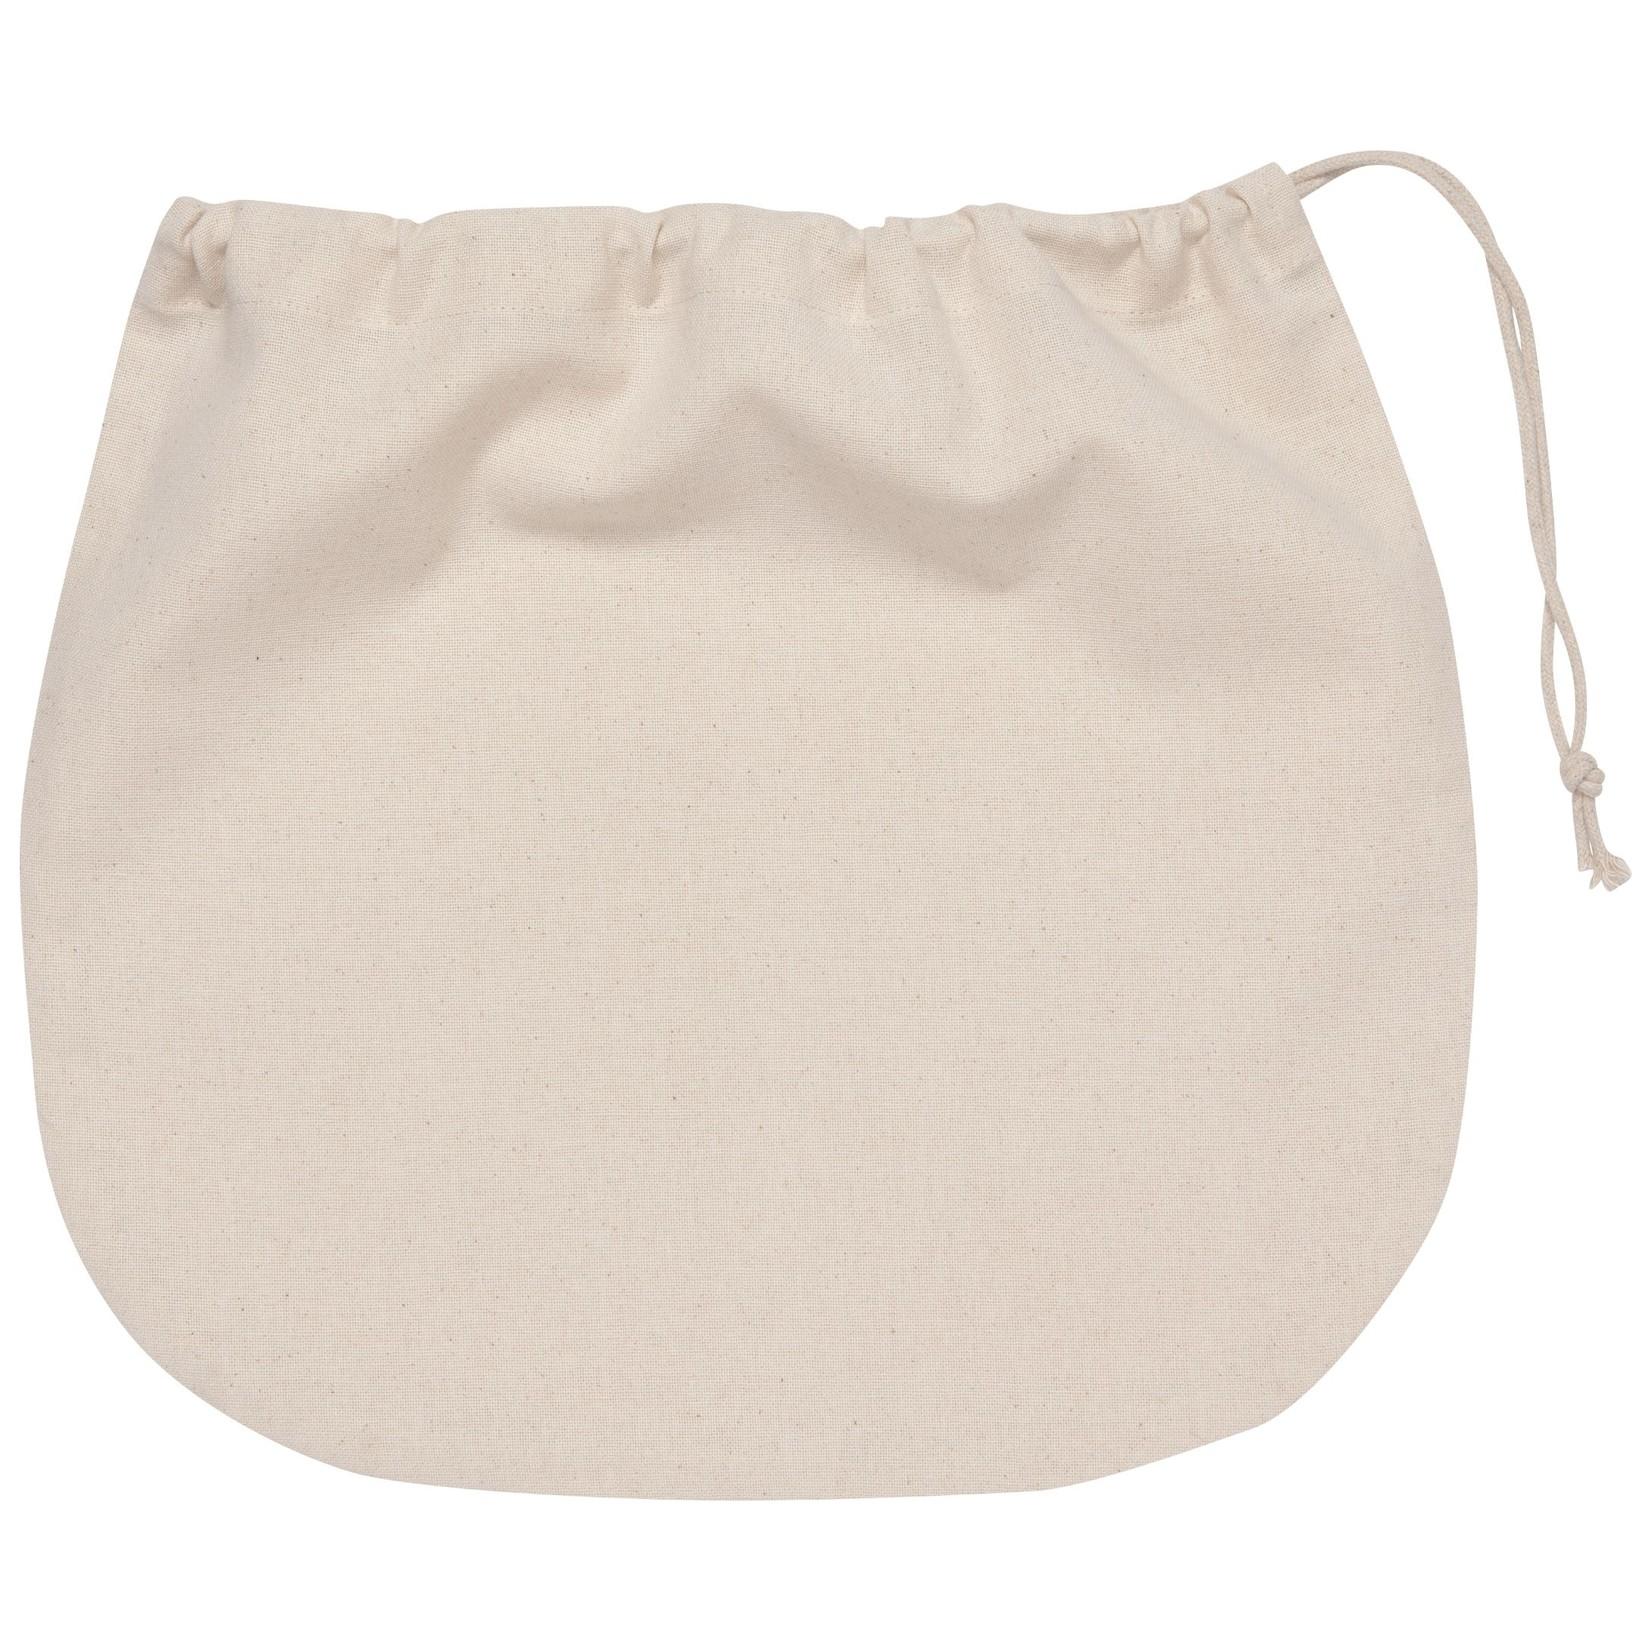 Now Designs Nut Milk Bag